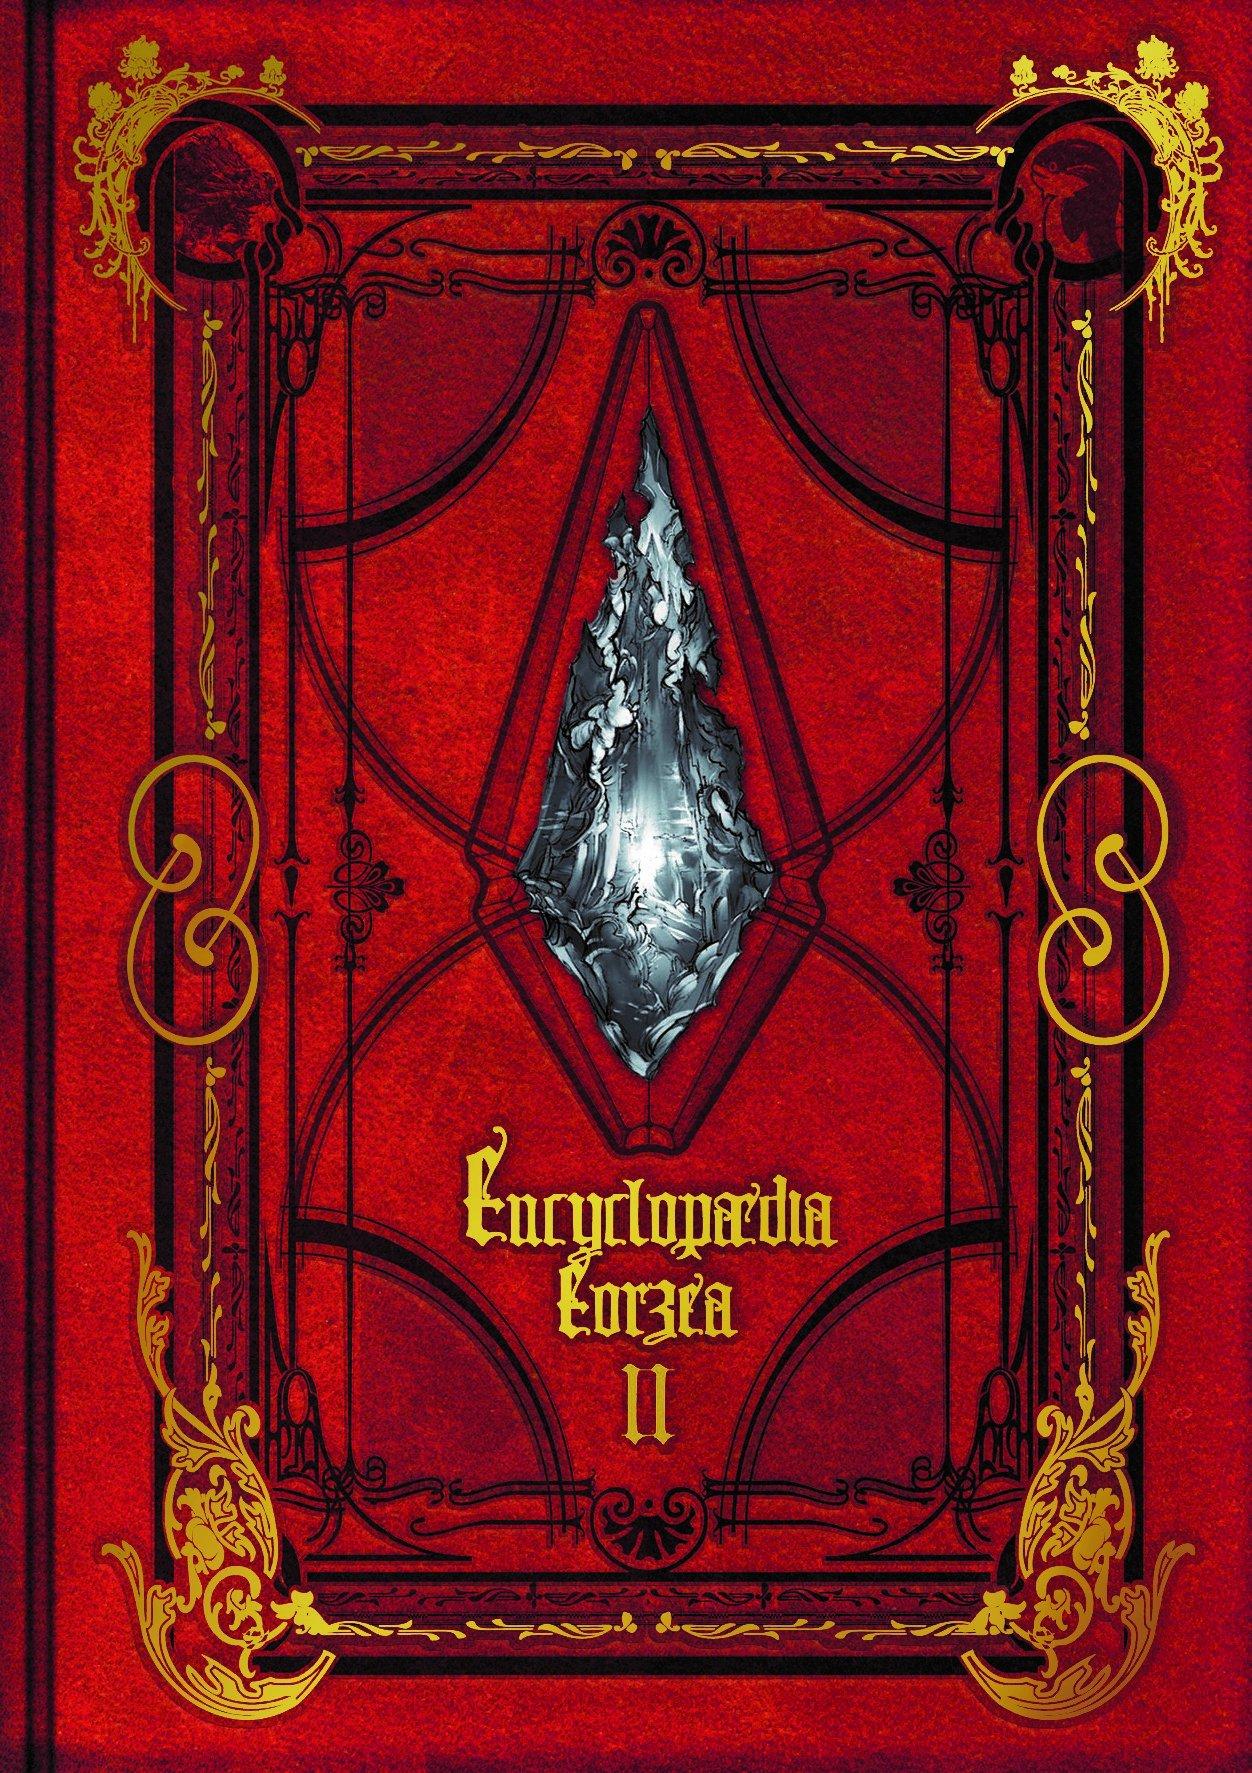 Encyclopaedia Eorzea The World of FINAL FANTASY XIV English Ver Volume II